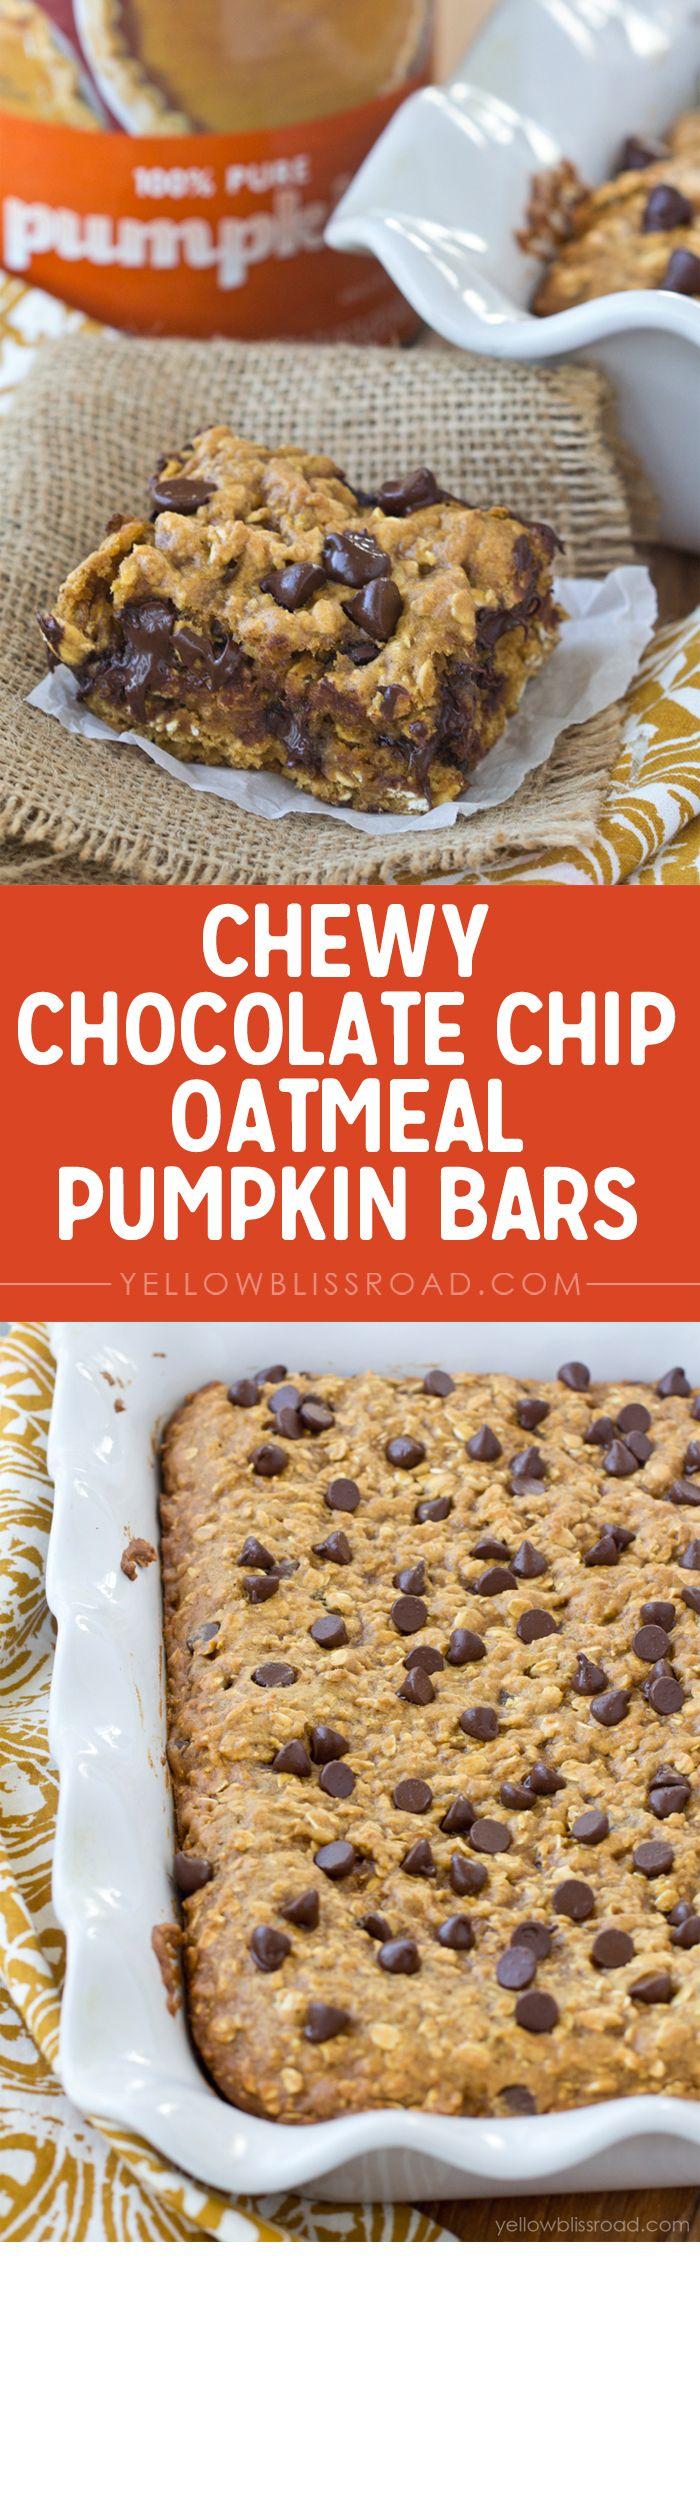 Chewy Chocolate Chip Oatmeal Pumpkin Bars: